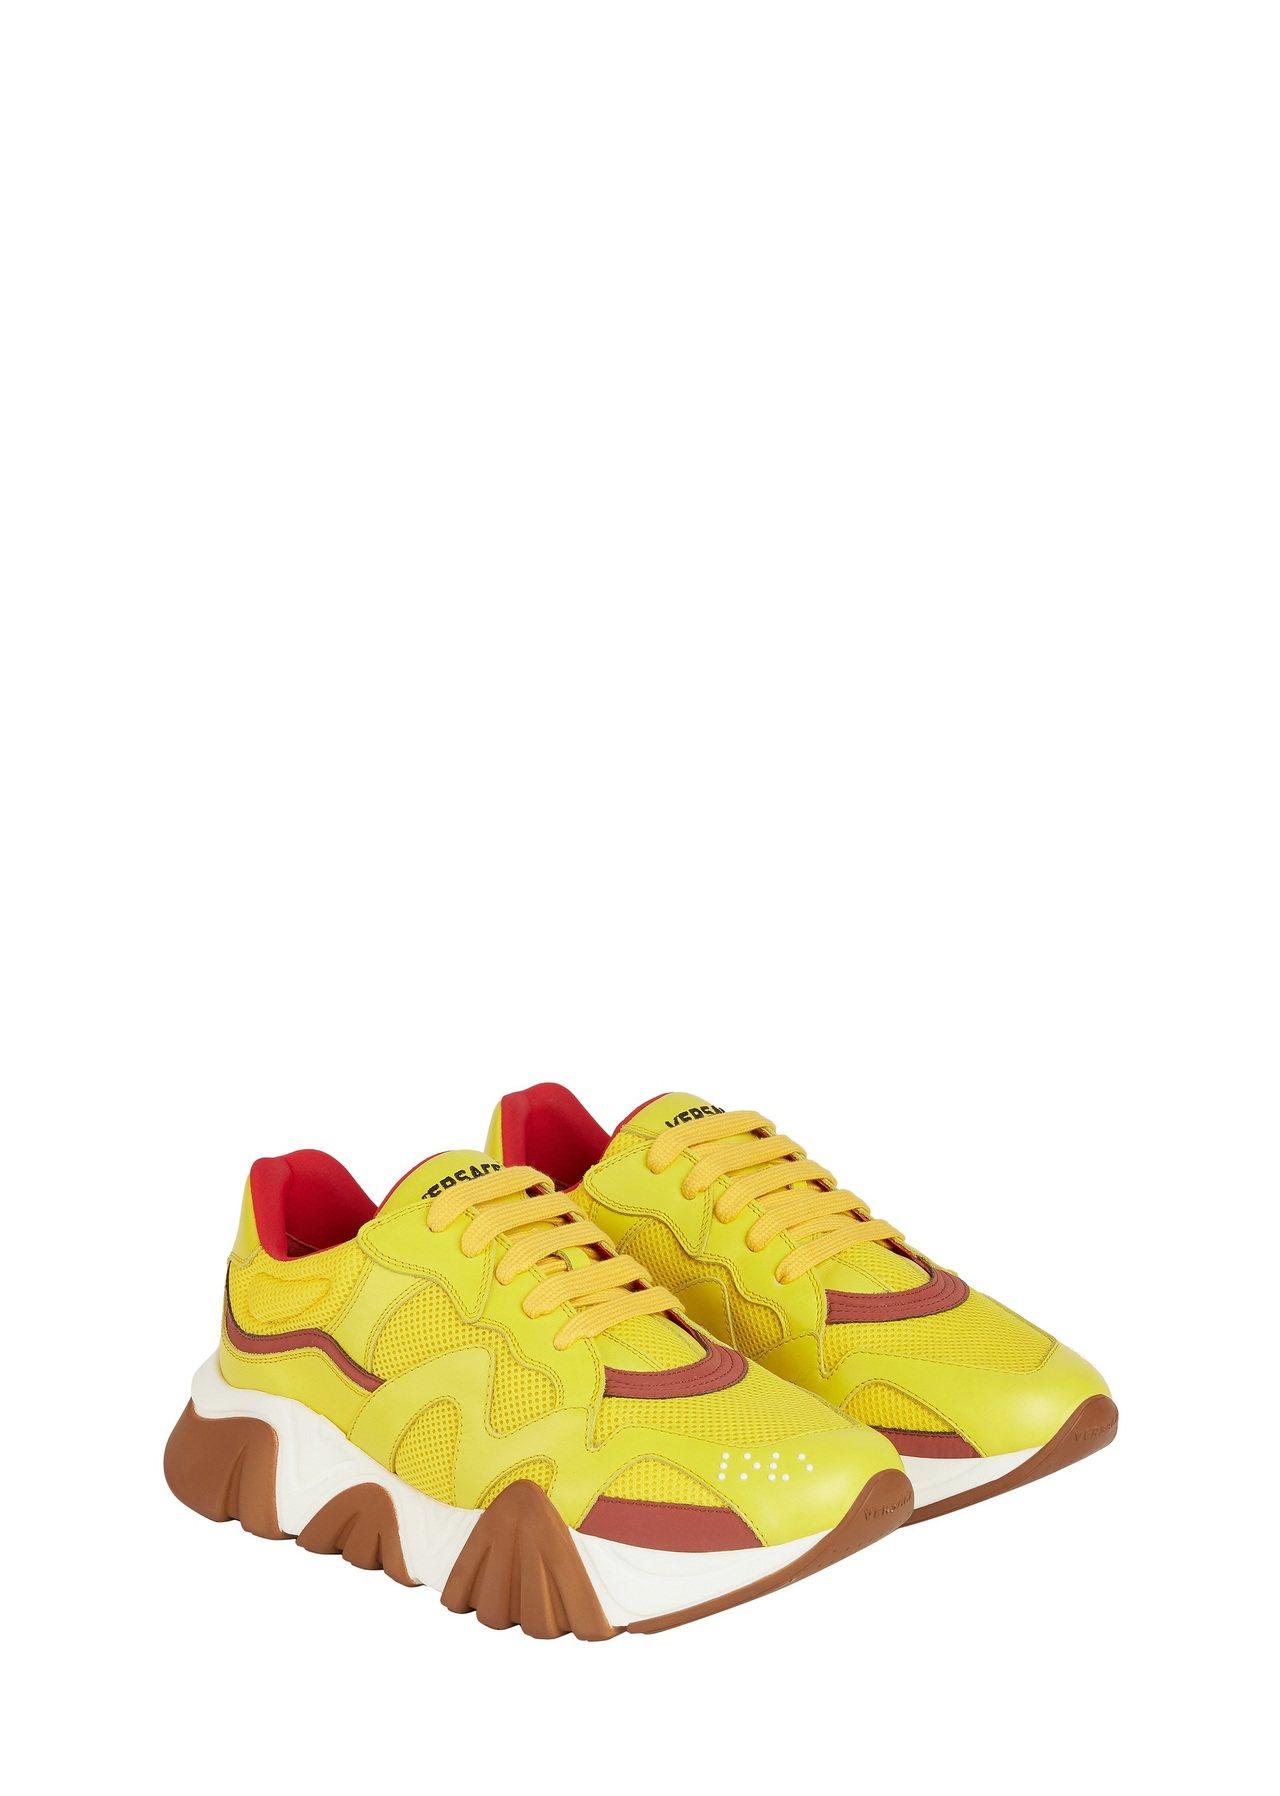 Versace Squalo亮黃運動鞋,29,000元。圖/VERSACE提供